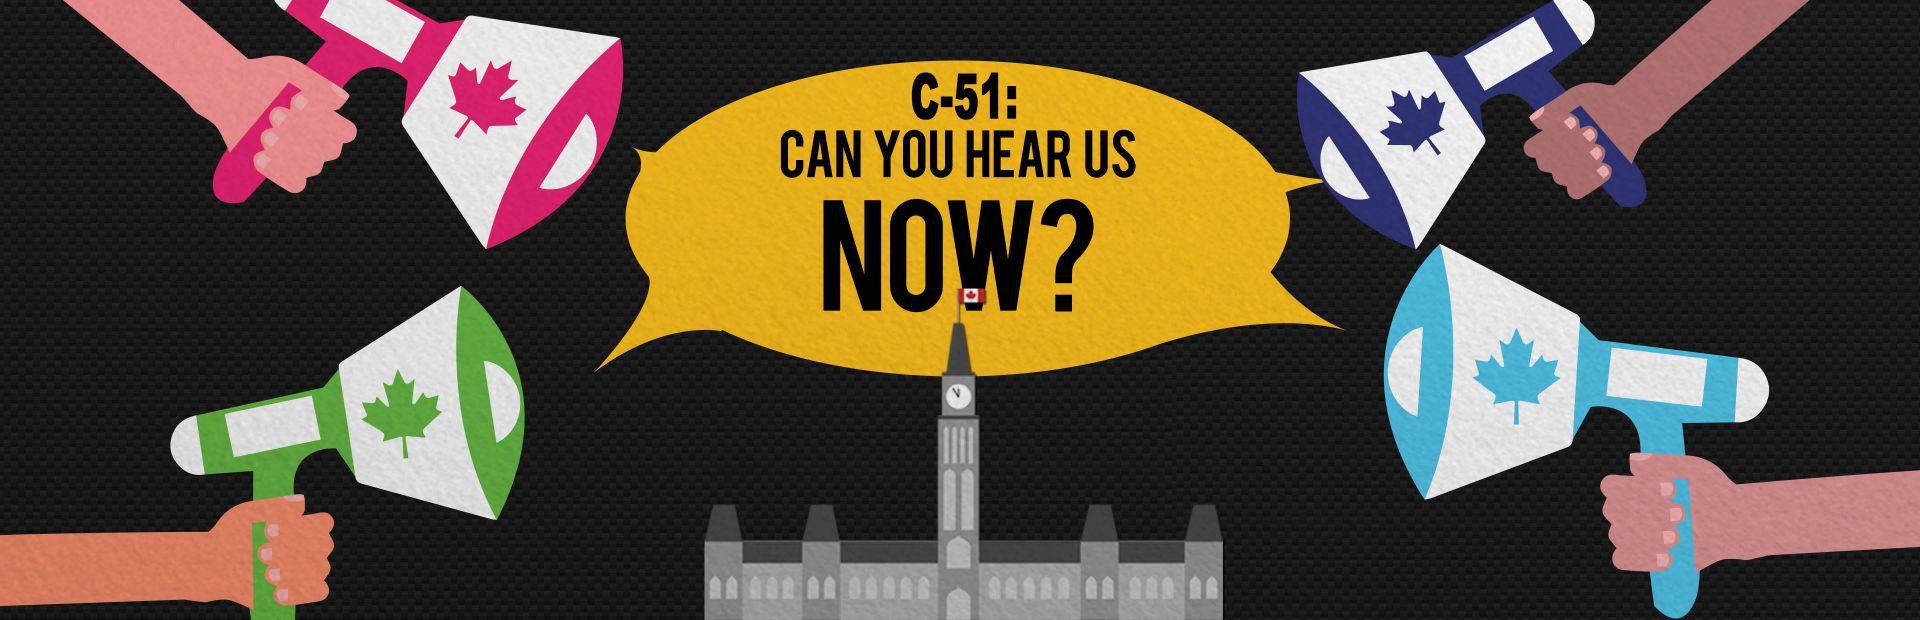 Demand a real, public consultation that will let us Kill Bill C-51